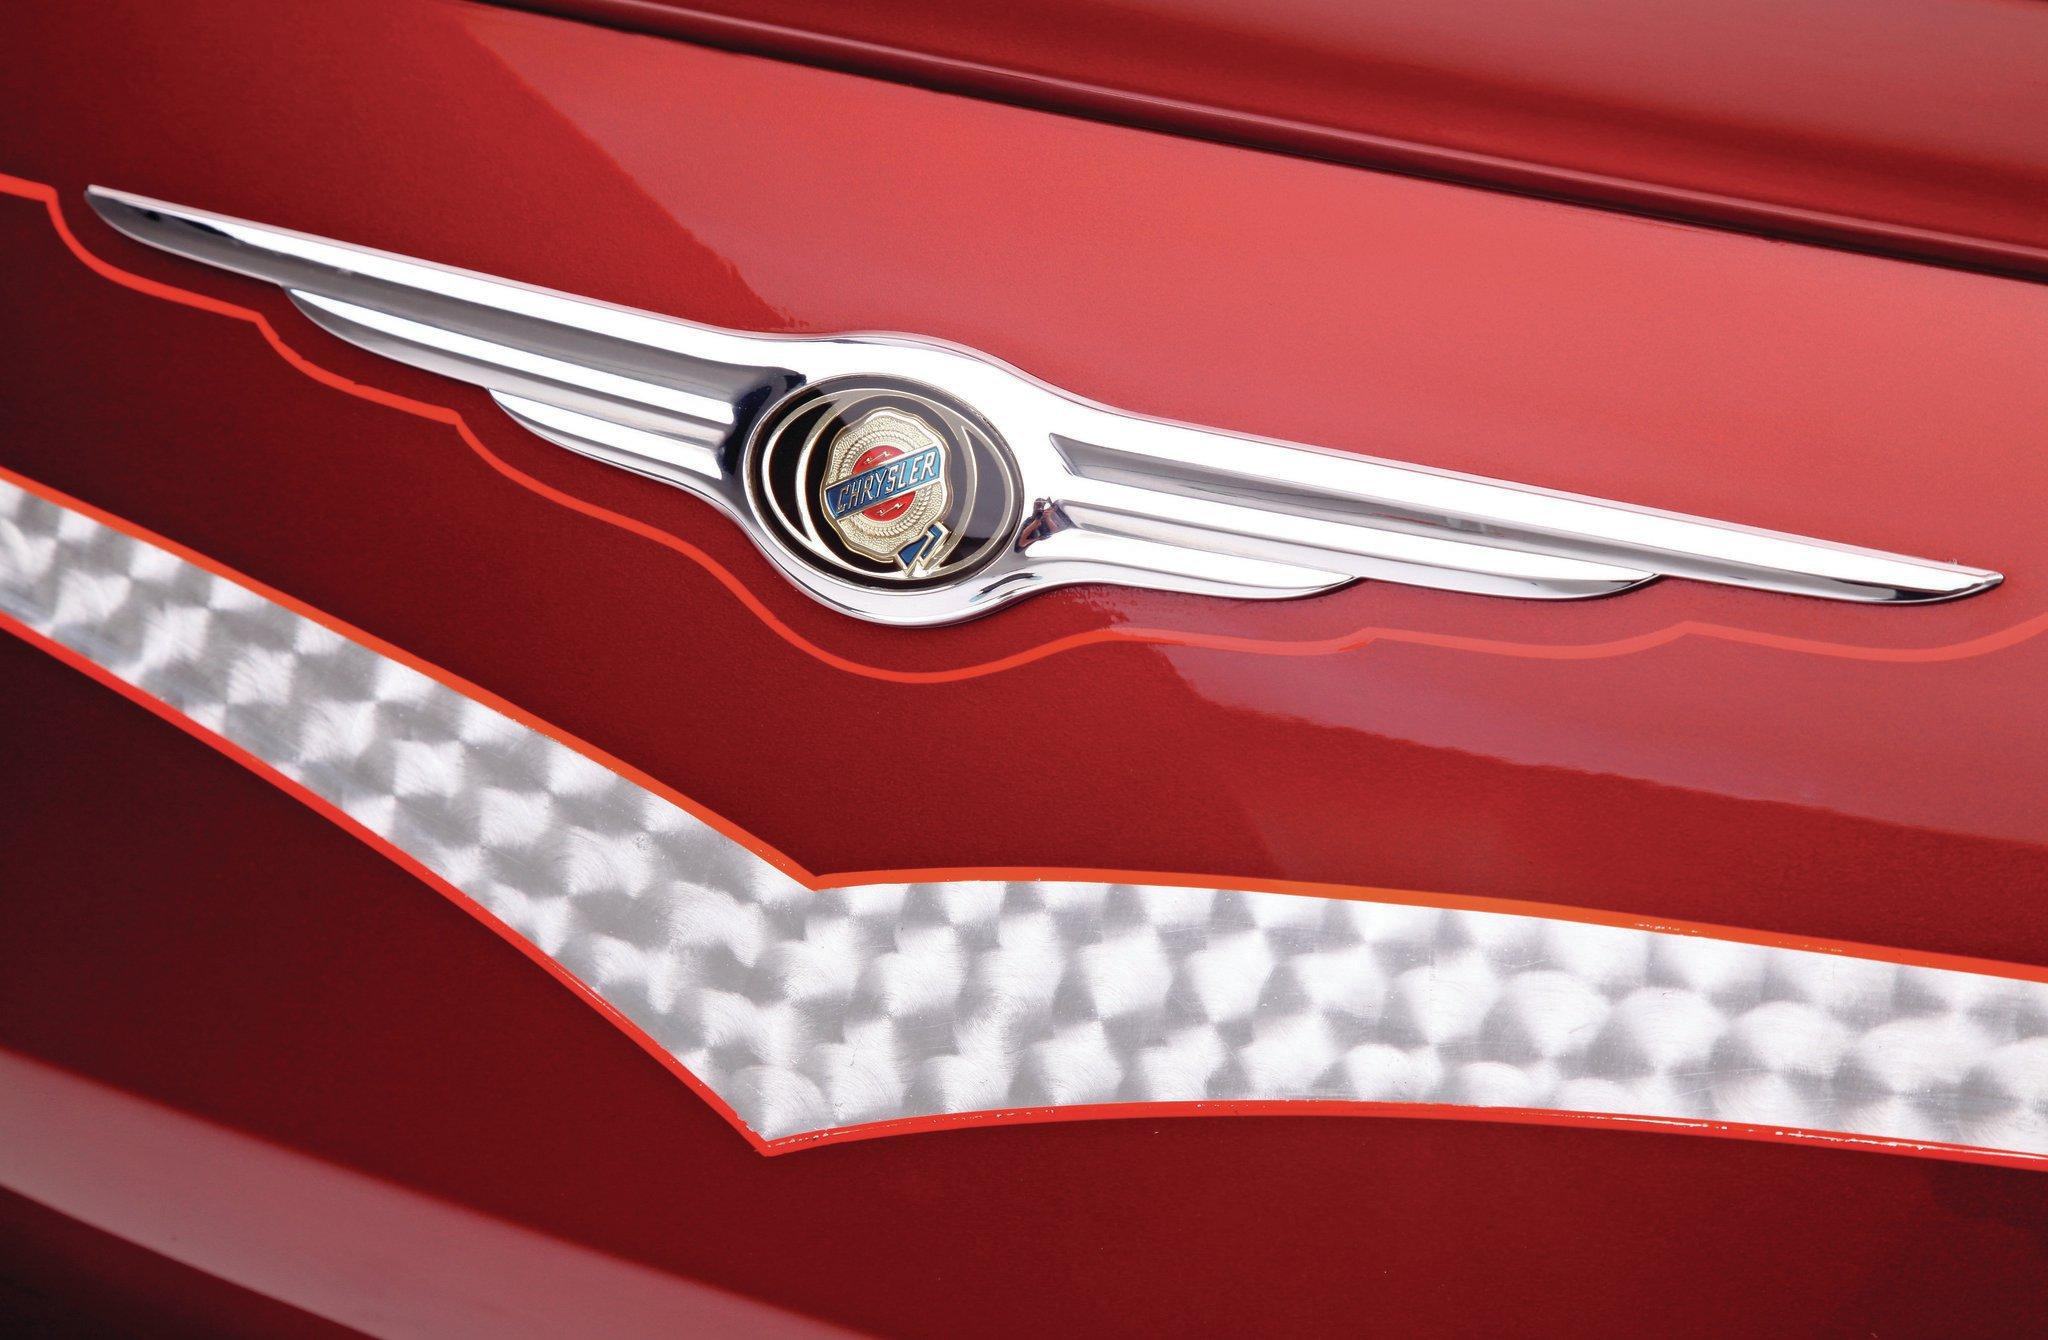 2007-chrysler-300C-front-badge-031